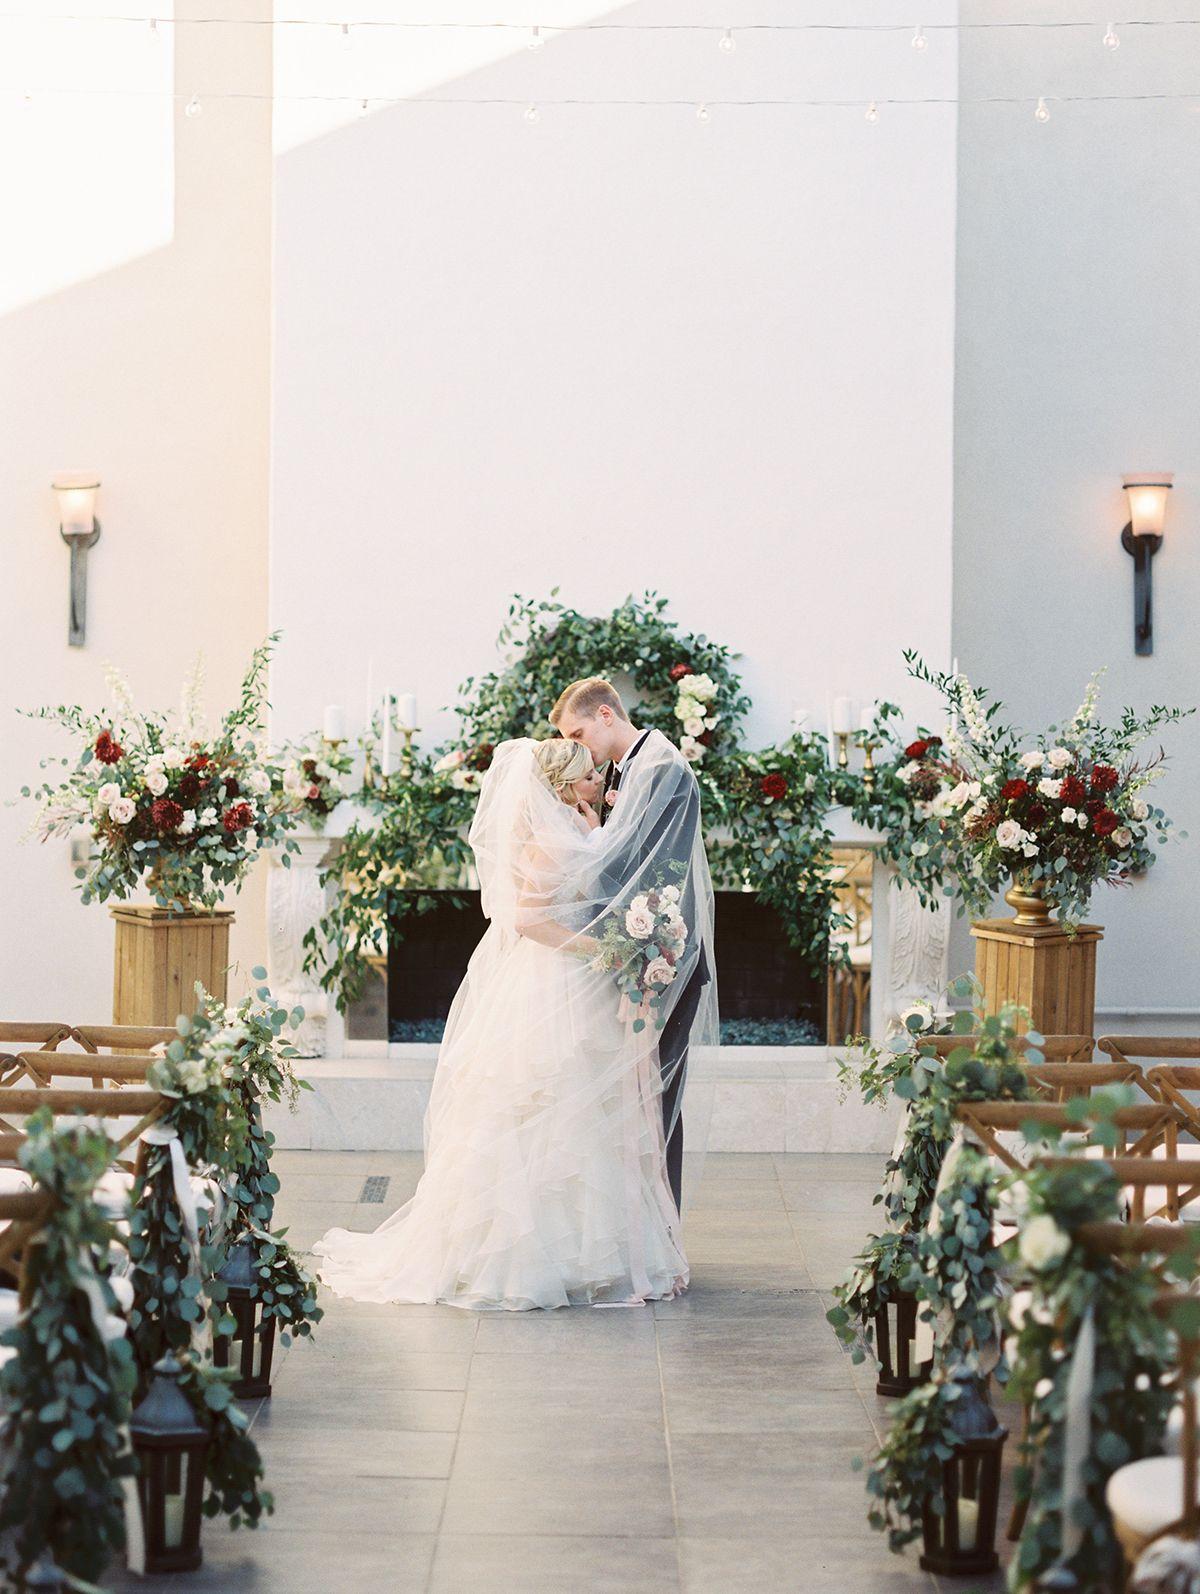 05647814fe secret garden romantic wedding ceremony - photo Charity Maurer  http   ruffledblog.com